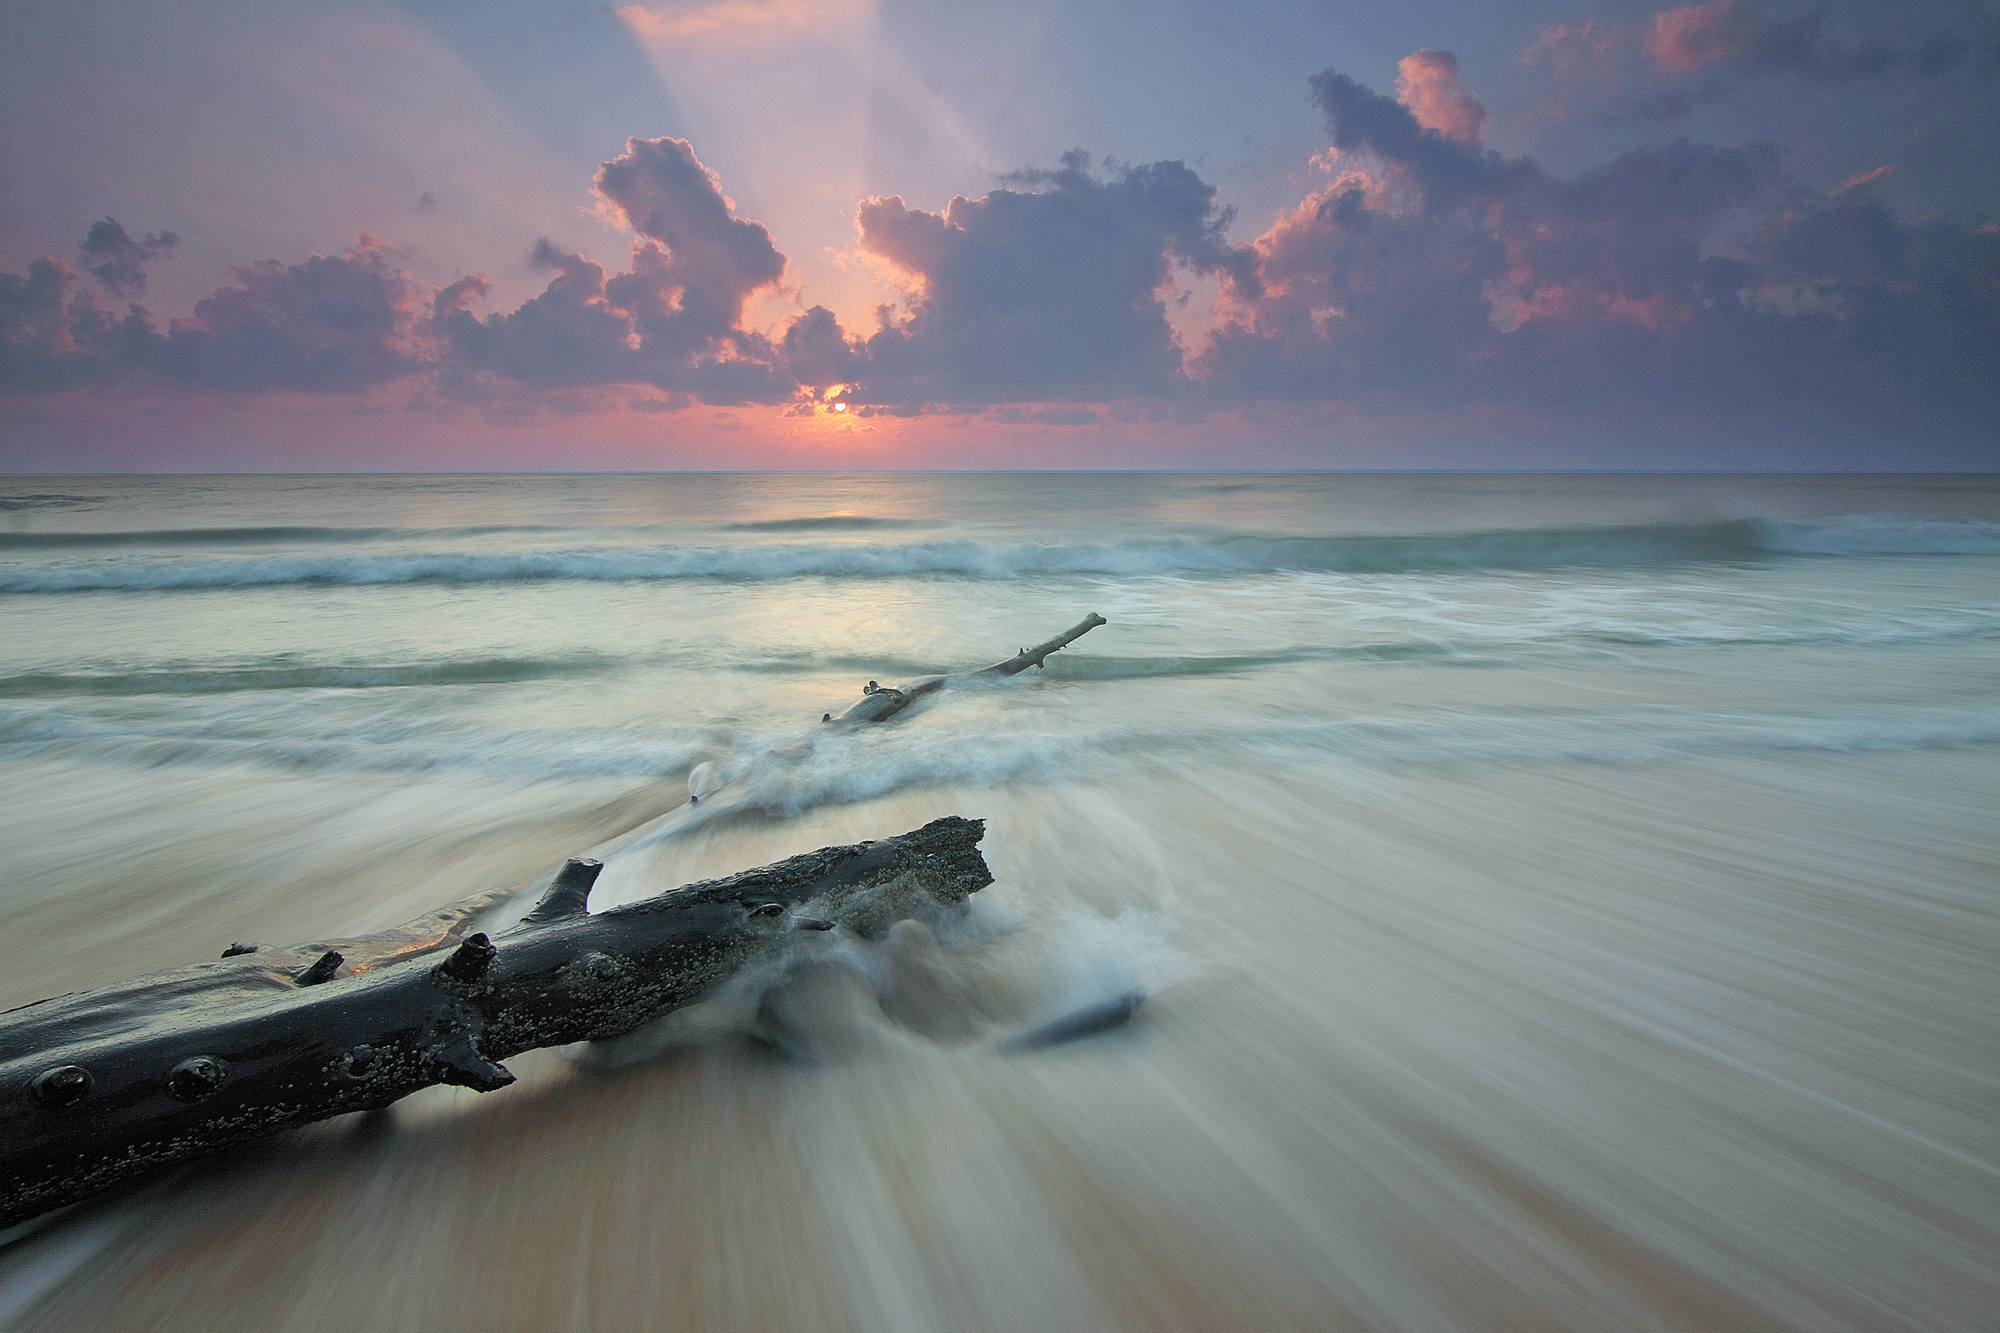 Psykoterapi ⌁ Meditation ⌁ Stressbehandling